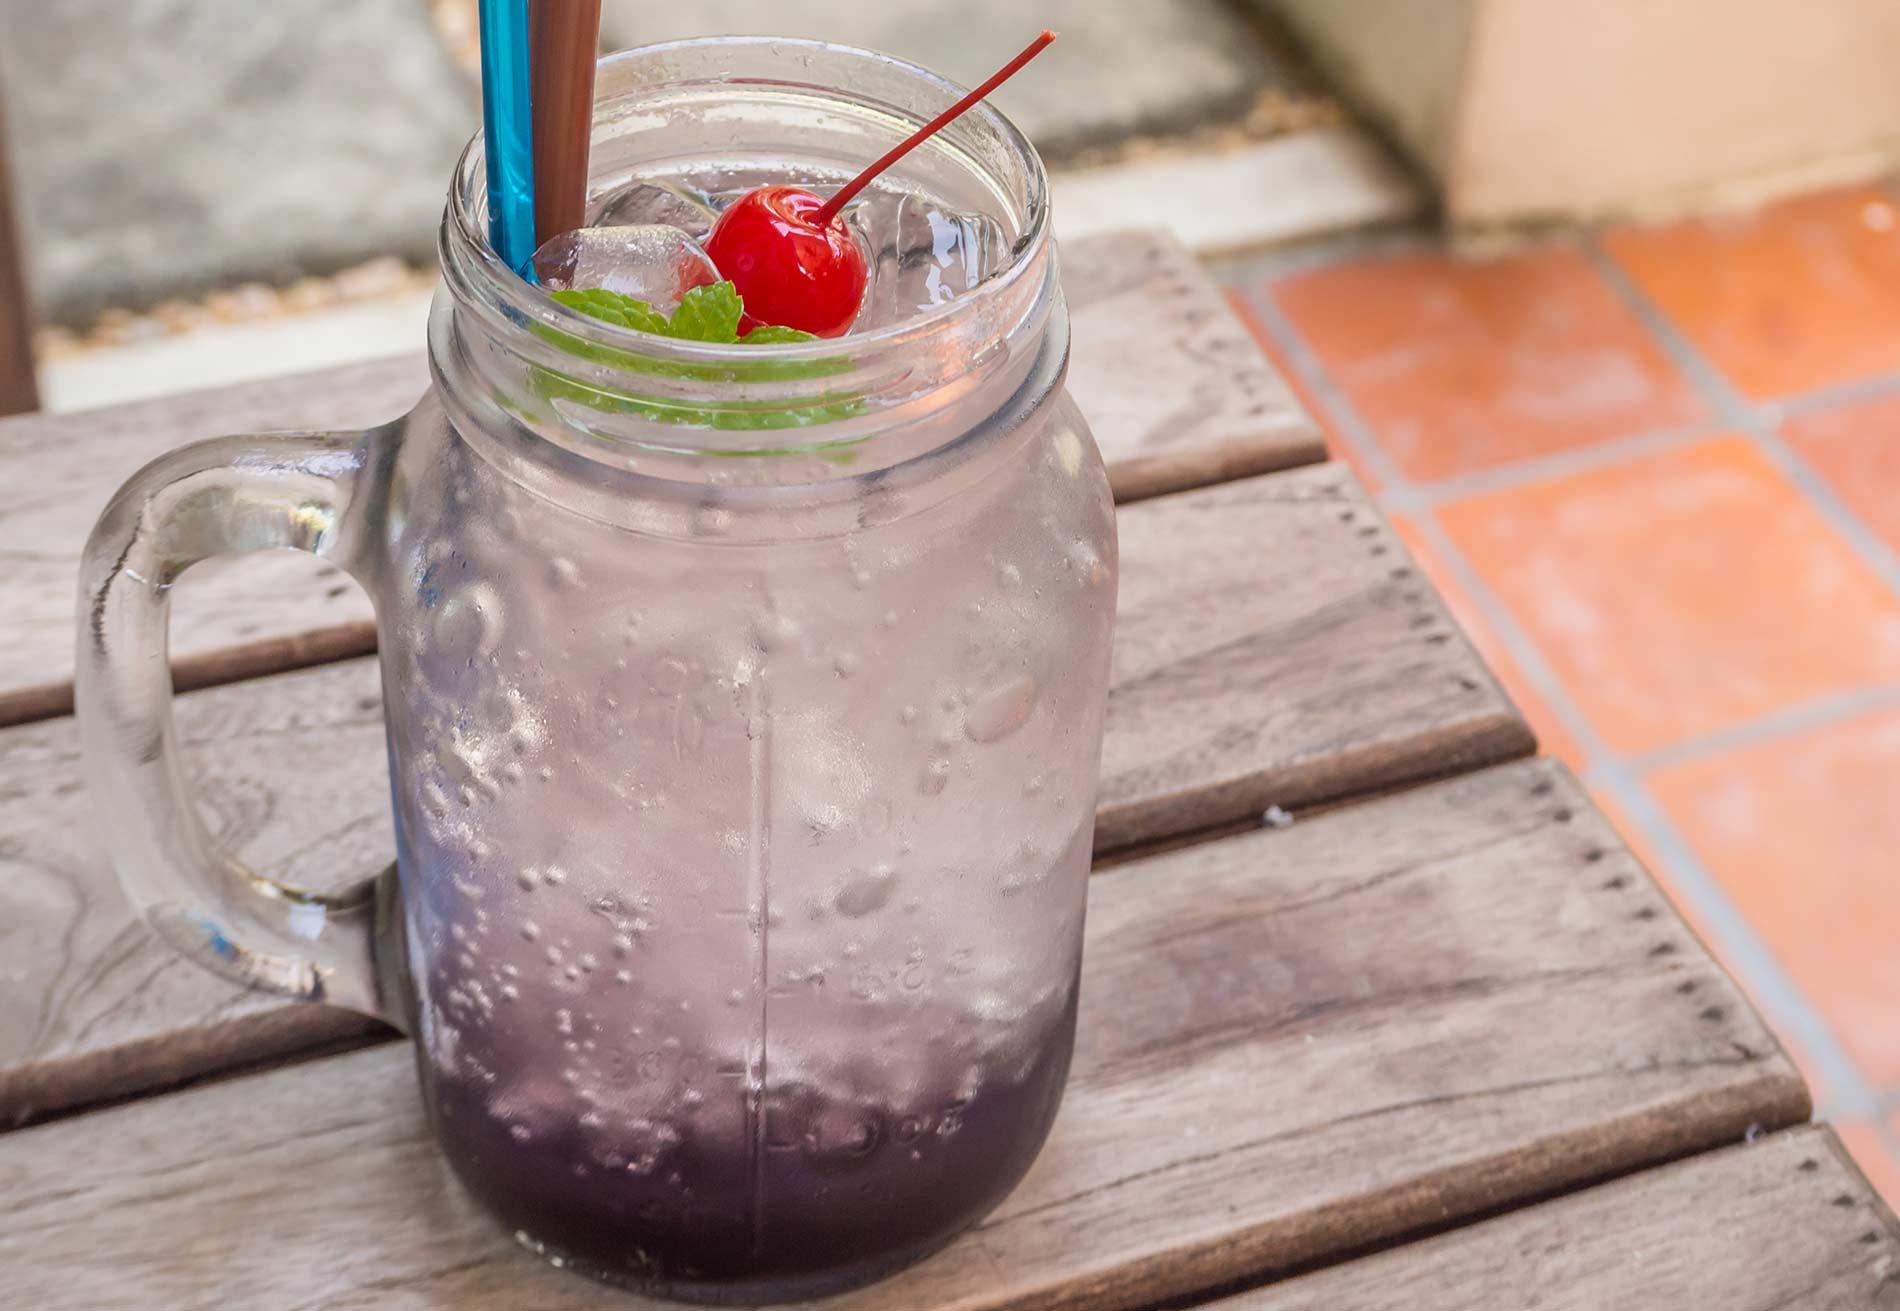 Soda in a mug glass